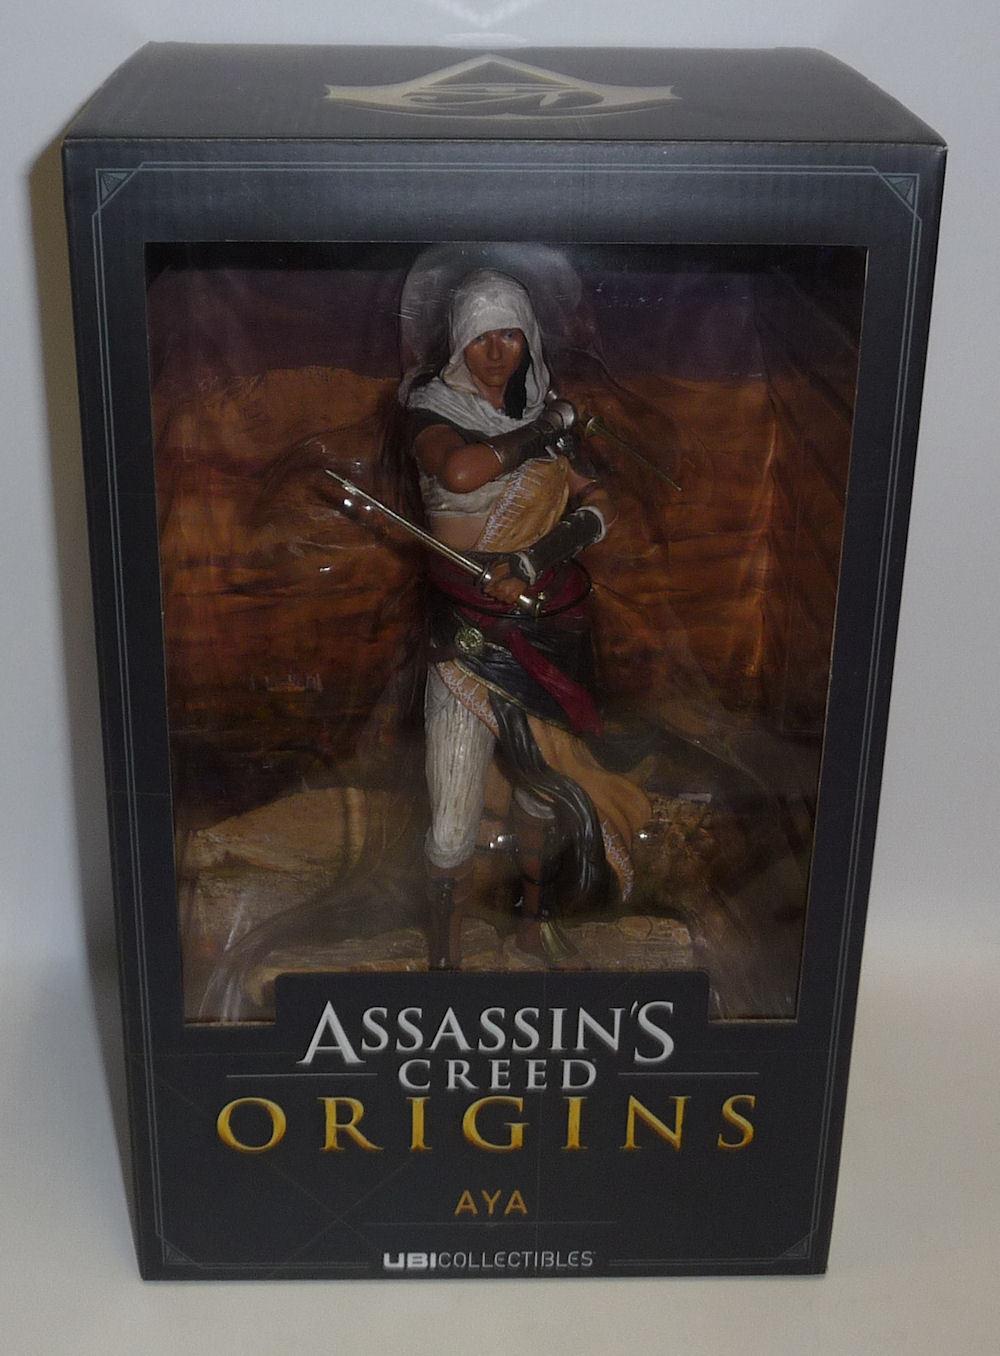 Assassin 's creed ursprünge aya ware actionfigur neue versiegelt original ubisoft